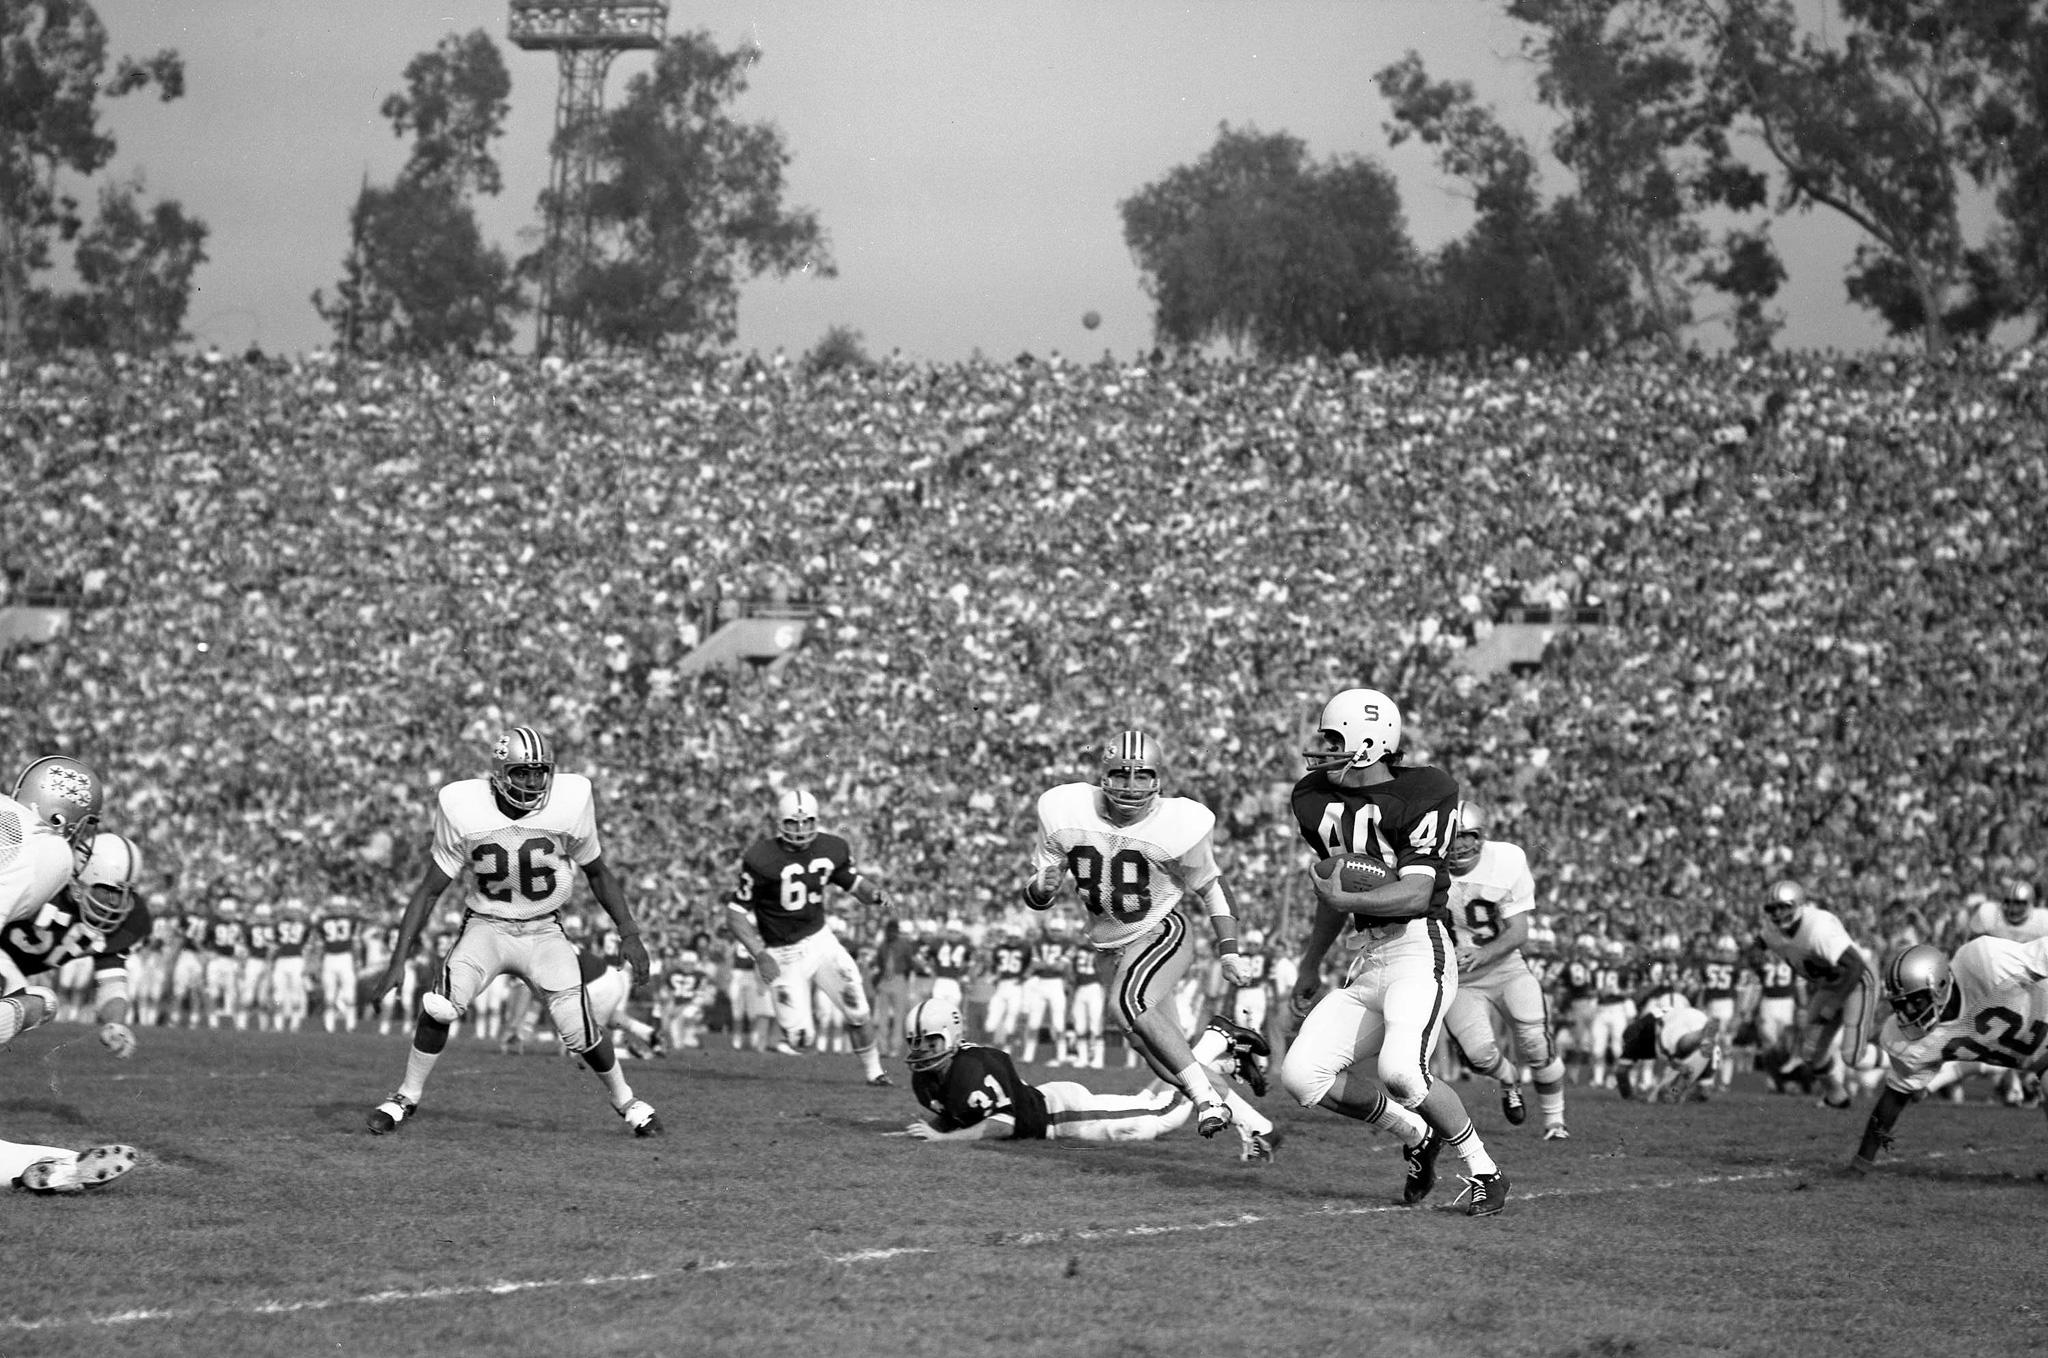 1971 Rose Bowl